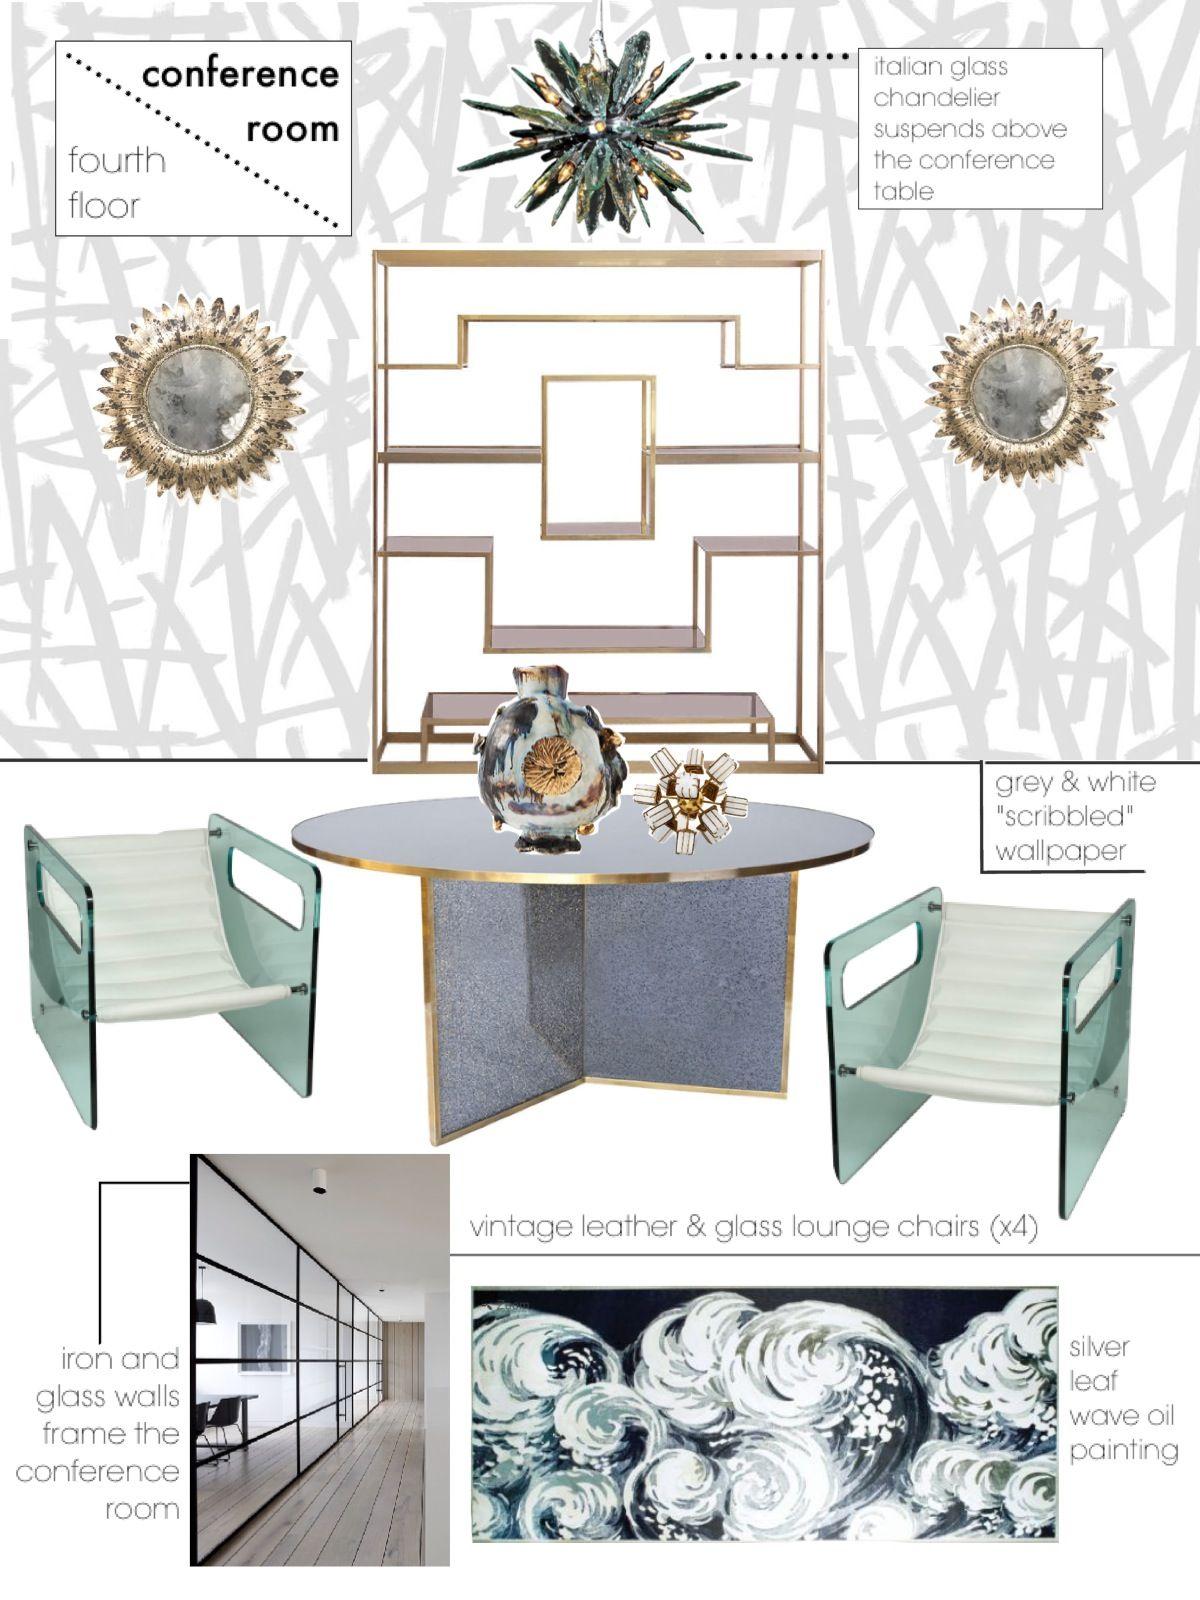 Room Design Application 8. conference room sketch | parsons interior design application